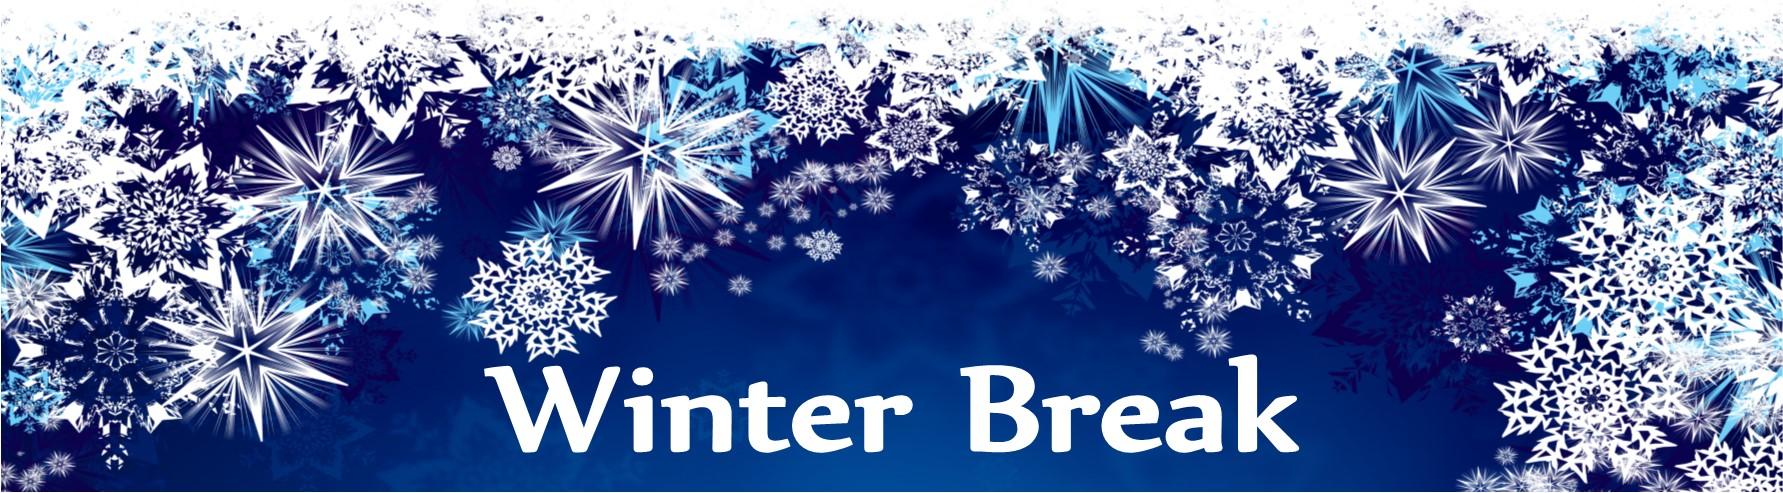 winter-break-banner-2